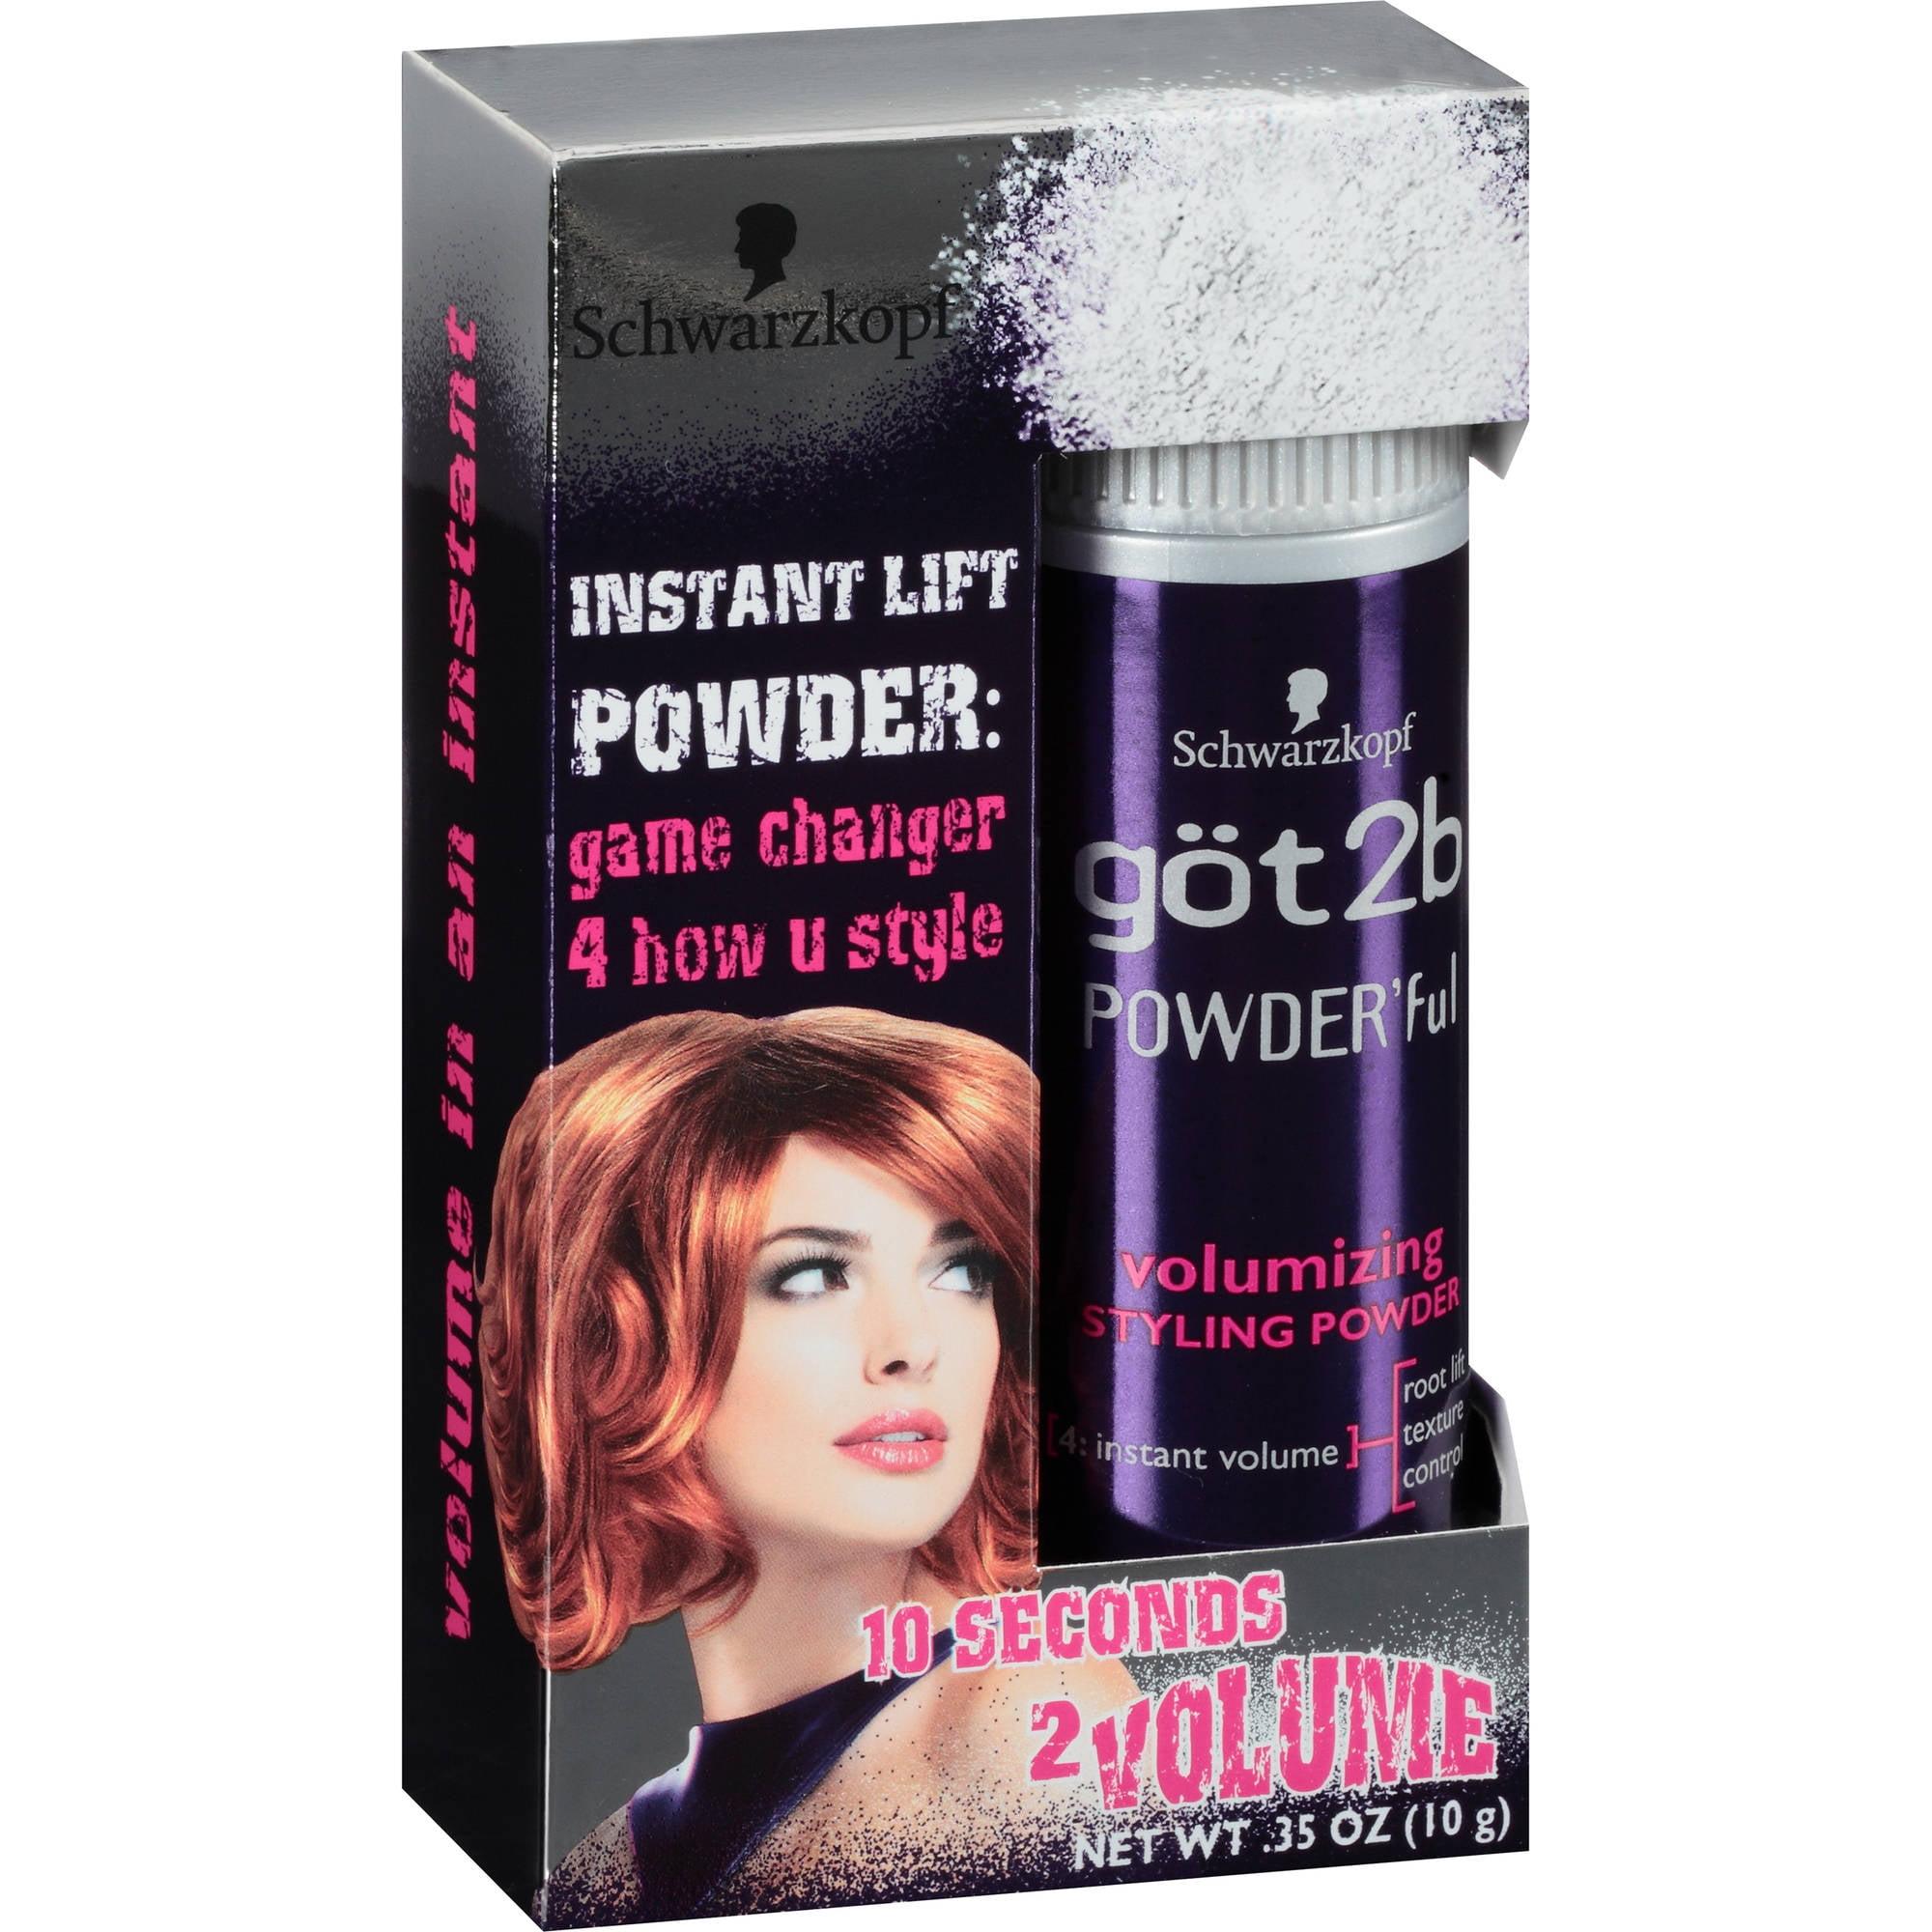 got2b Powder'ful Volumizing Styling Powder, .35 oz